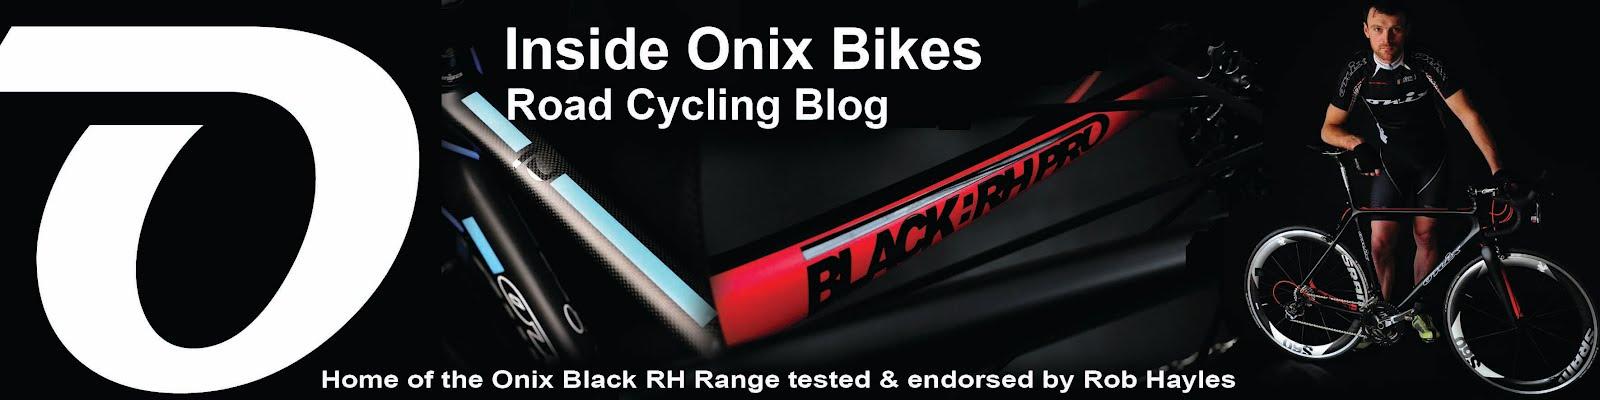 Inside Onix Bikes